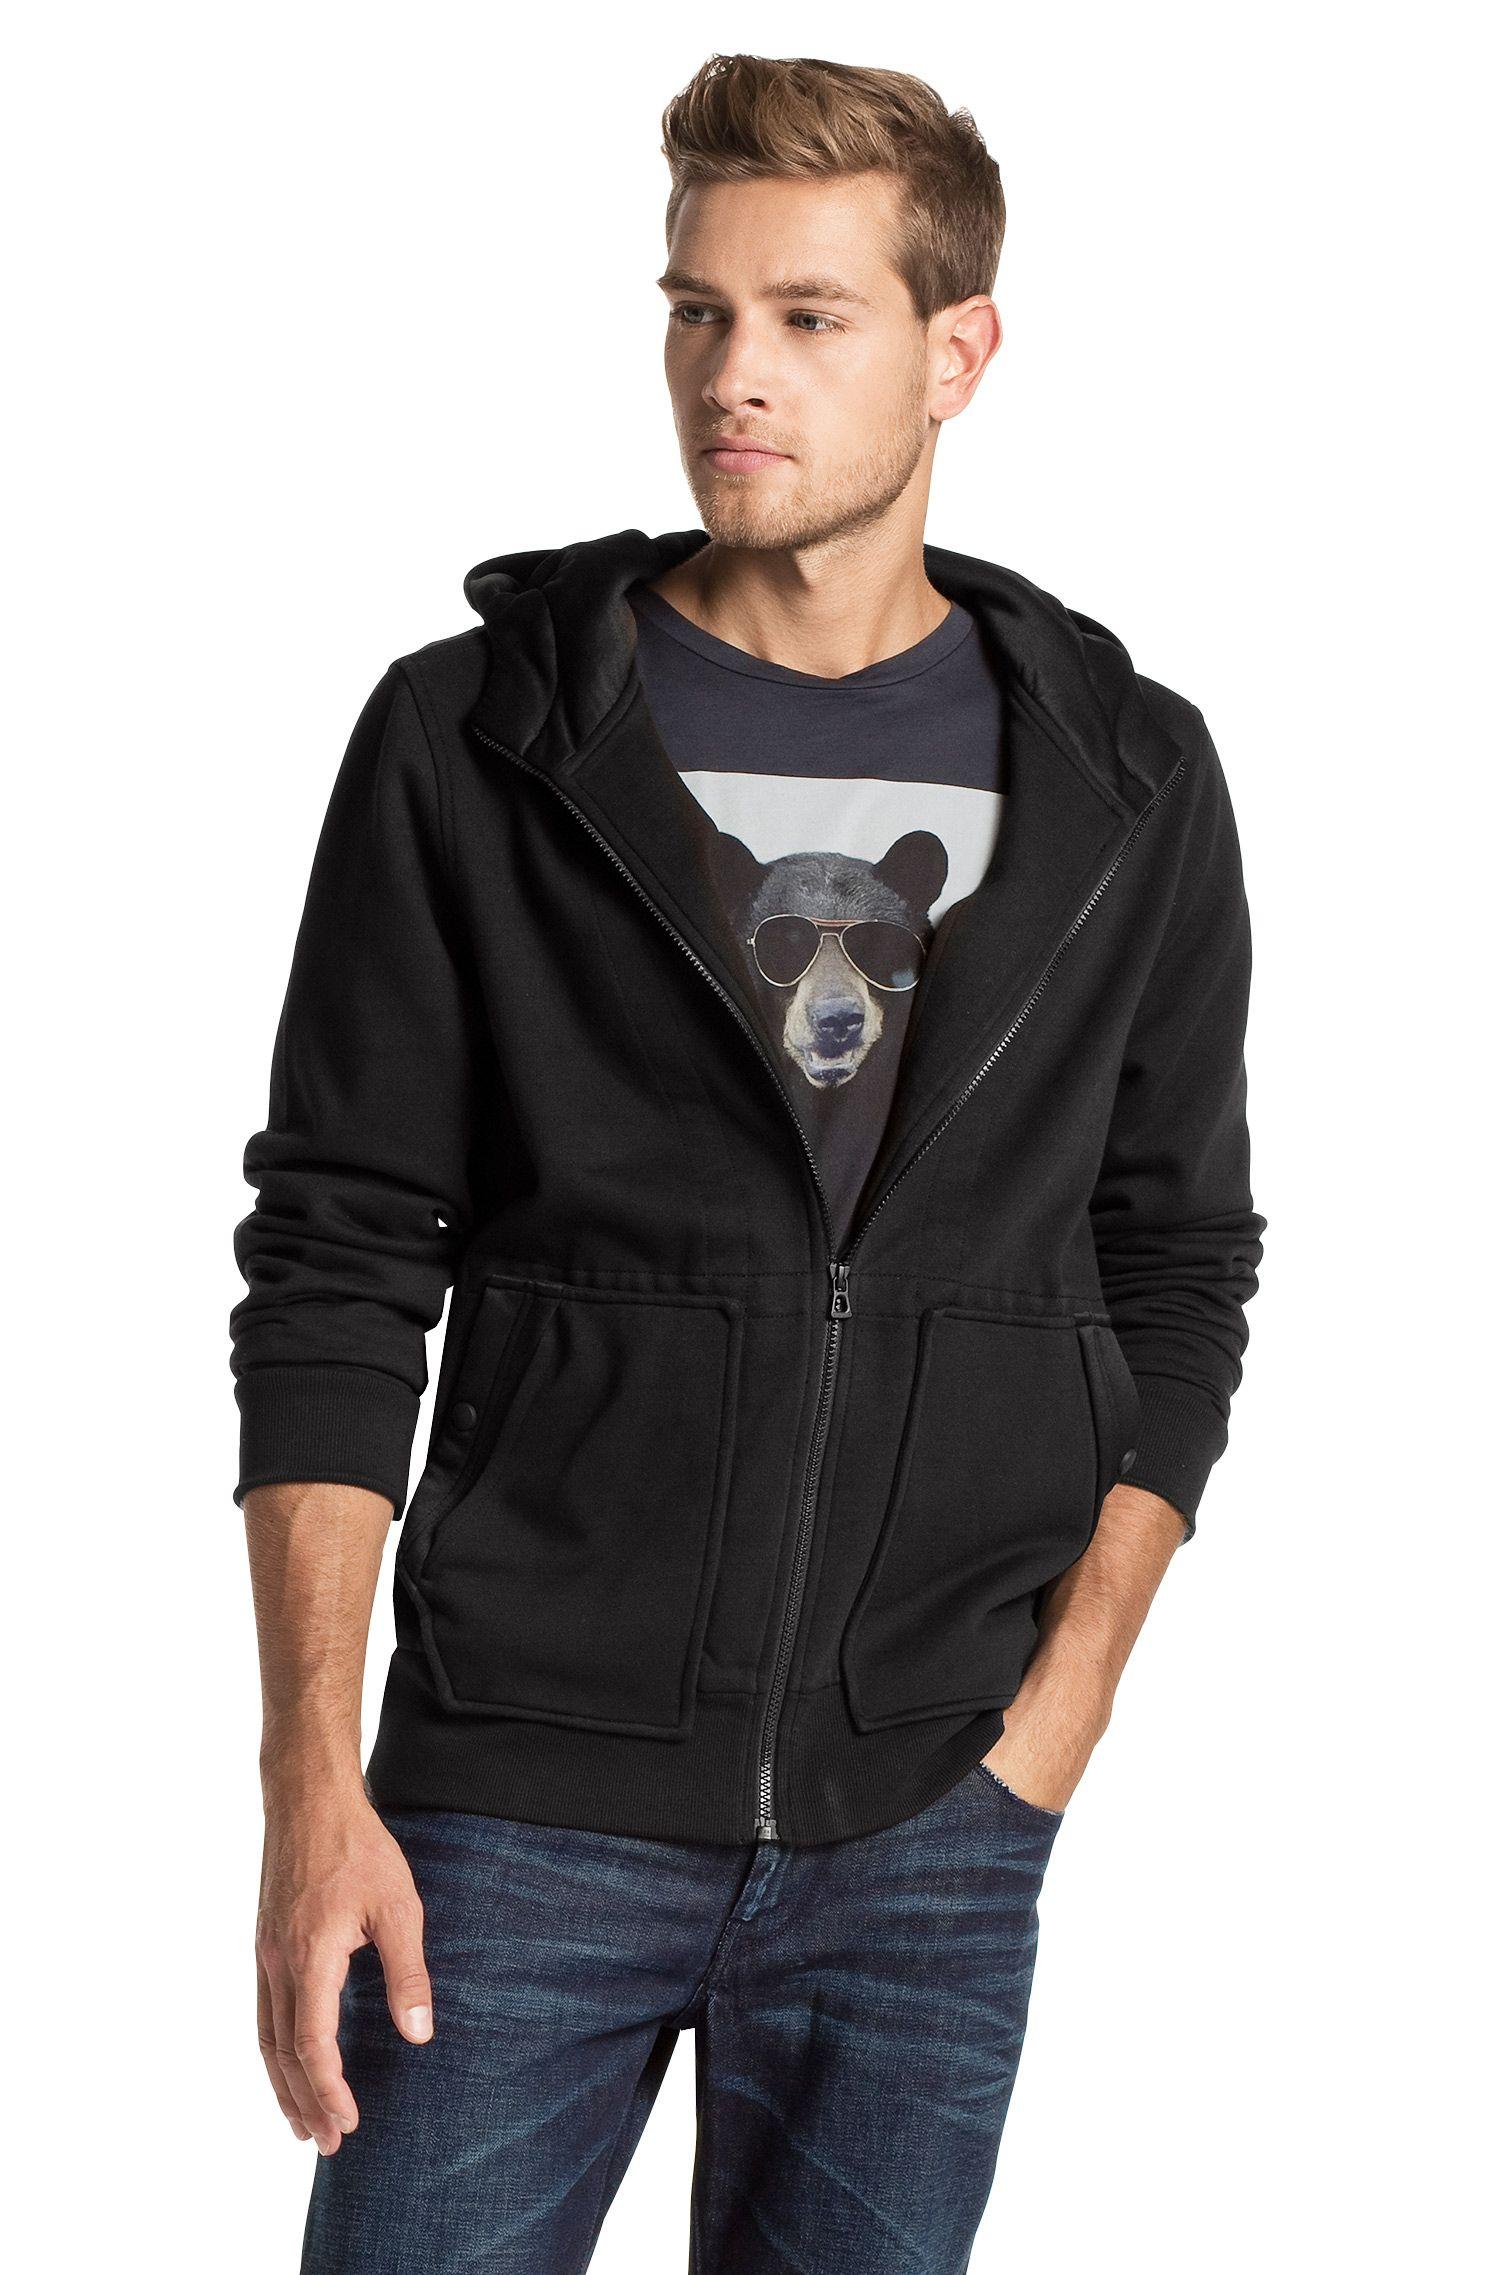 Kapuzen-Sweatshirt-Jacke ´Ztarter` aus Baumwolle